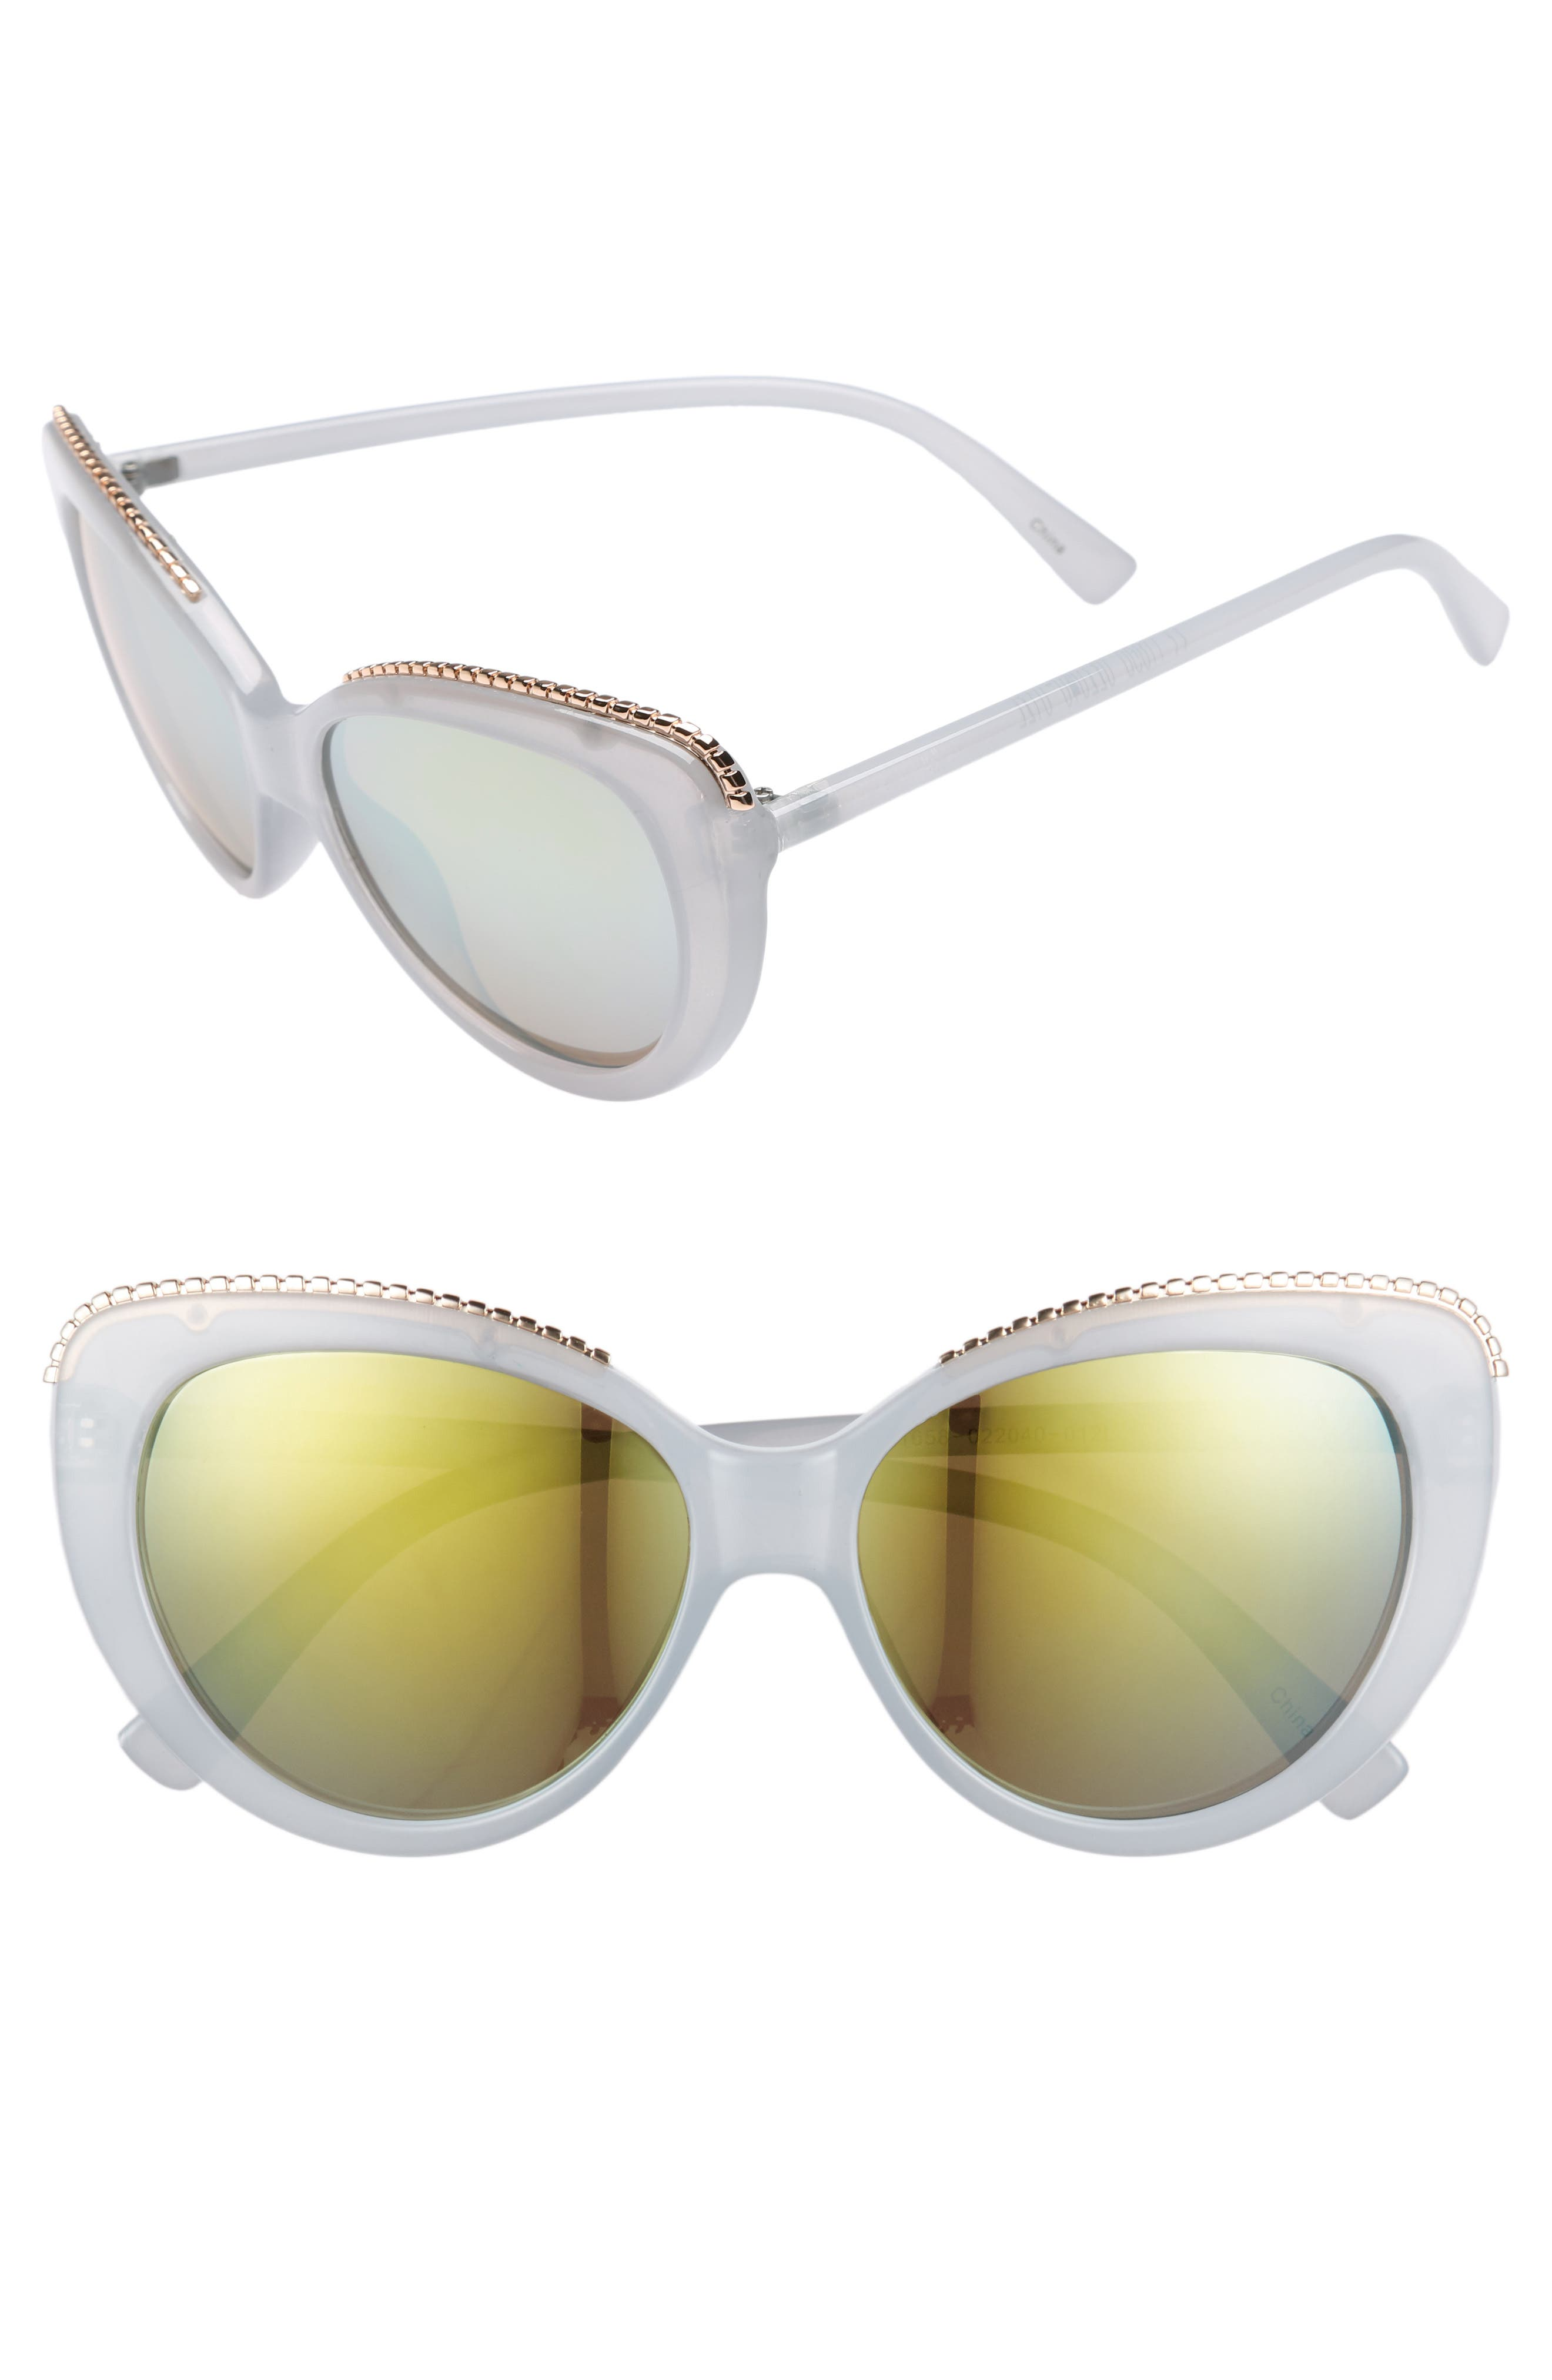 54mm Metal Trim Sunglasses,                             Main thumbnail 1, color,                             Blue